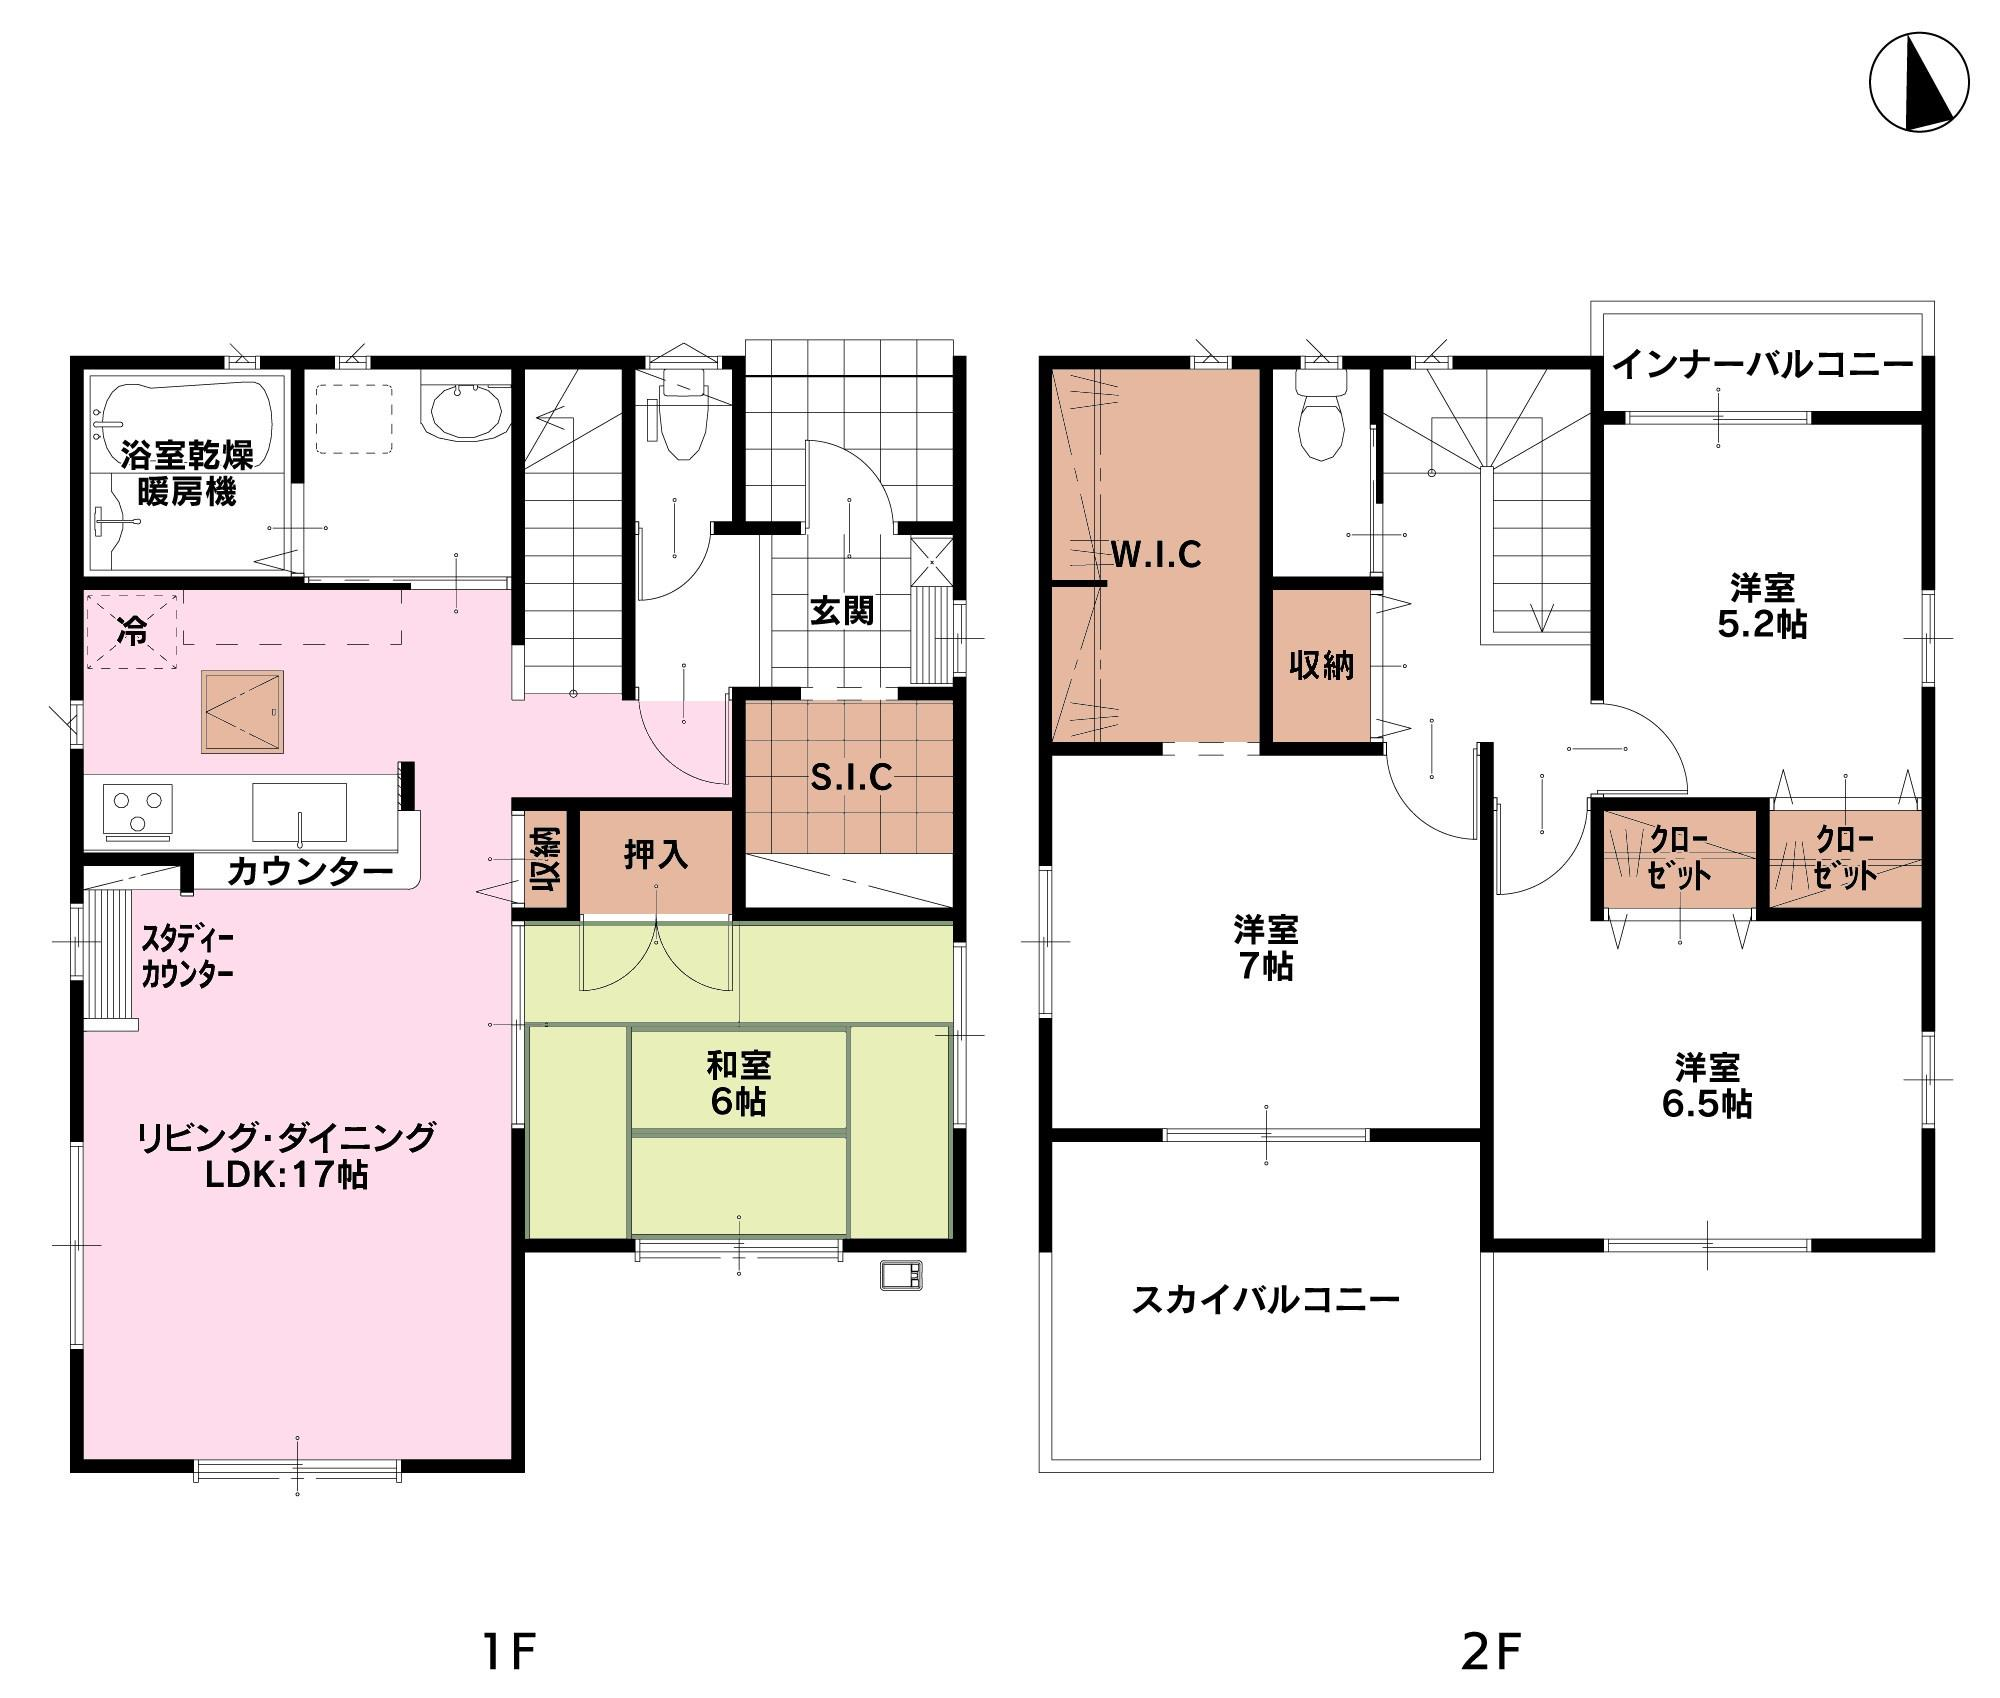 1号棟間取り図 価格(税込):2780万円